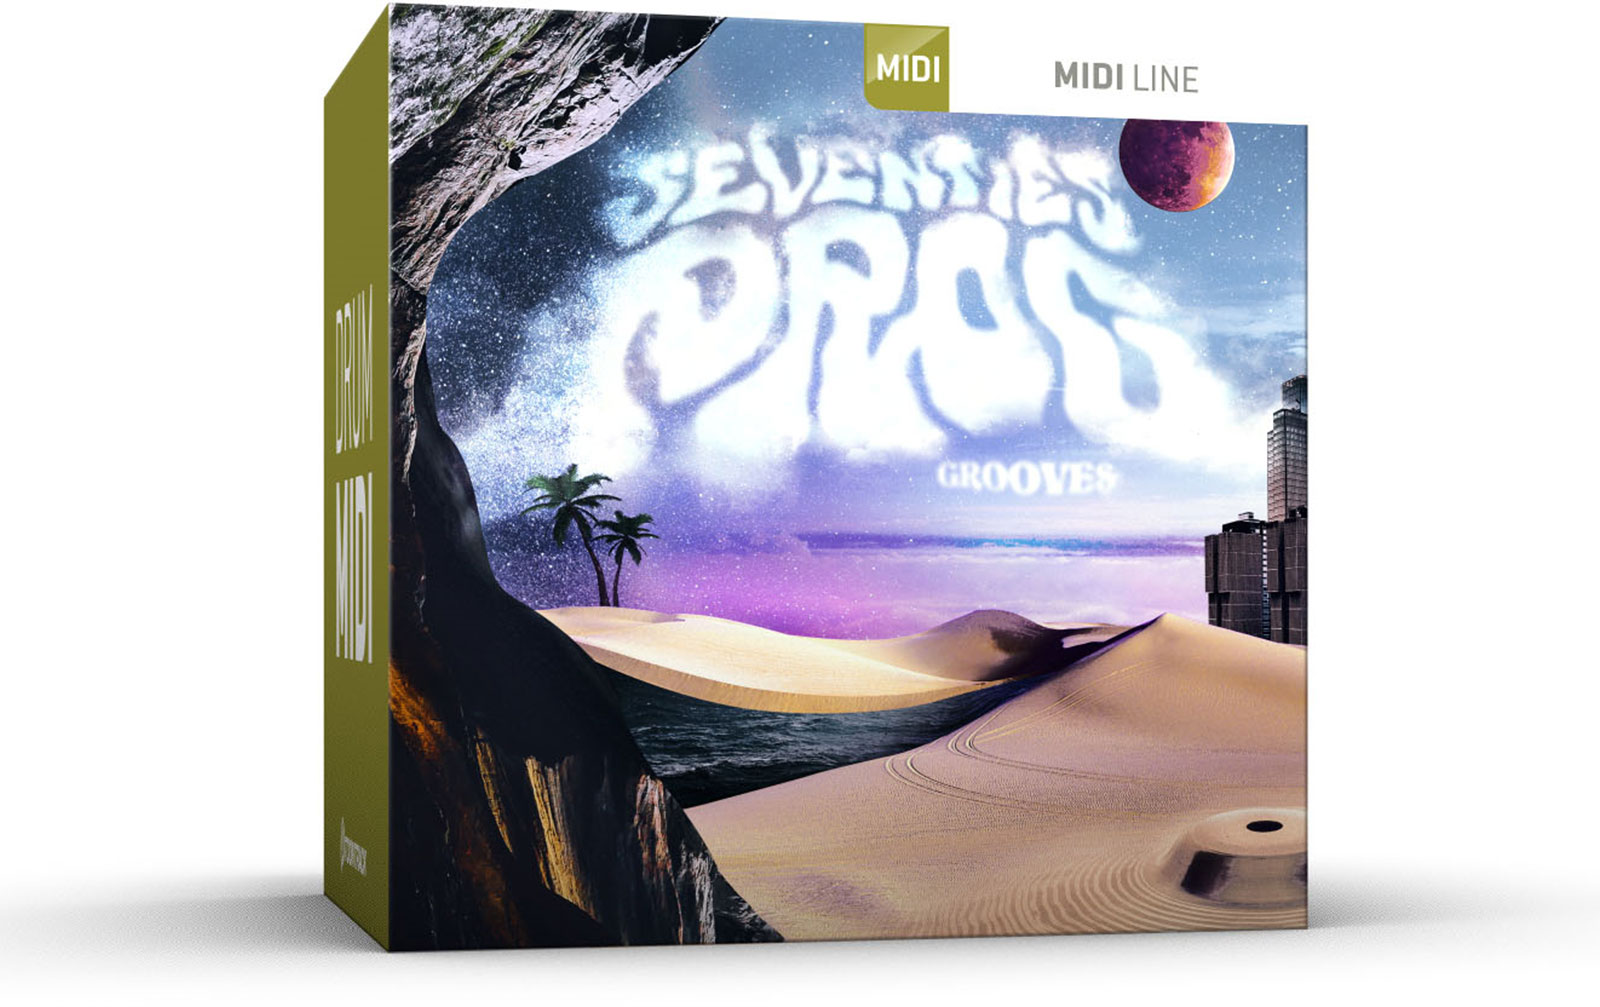 toontrack-seventies-prog-grooves-midi-pack-download-